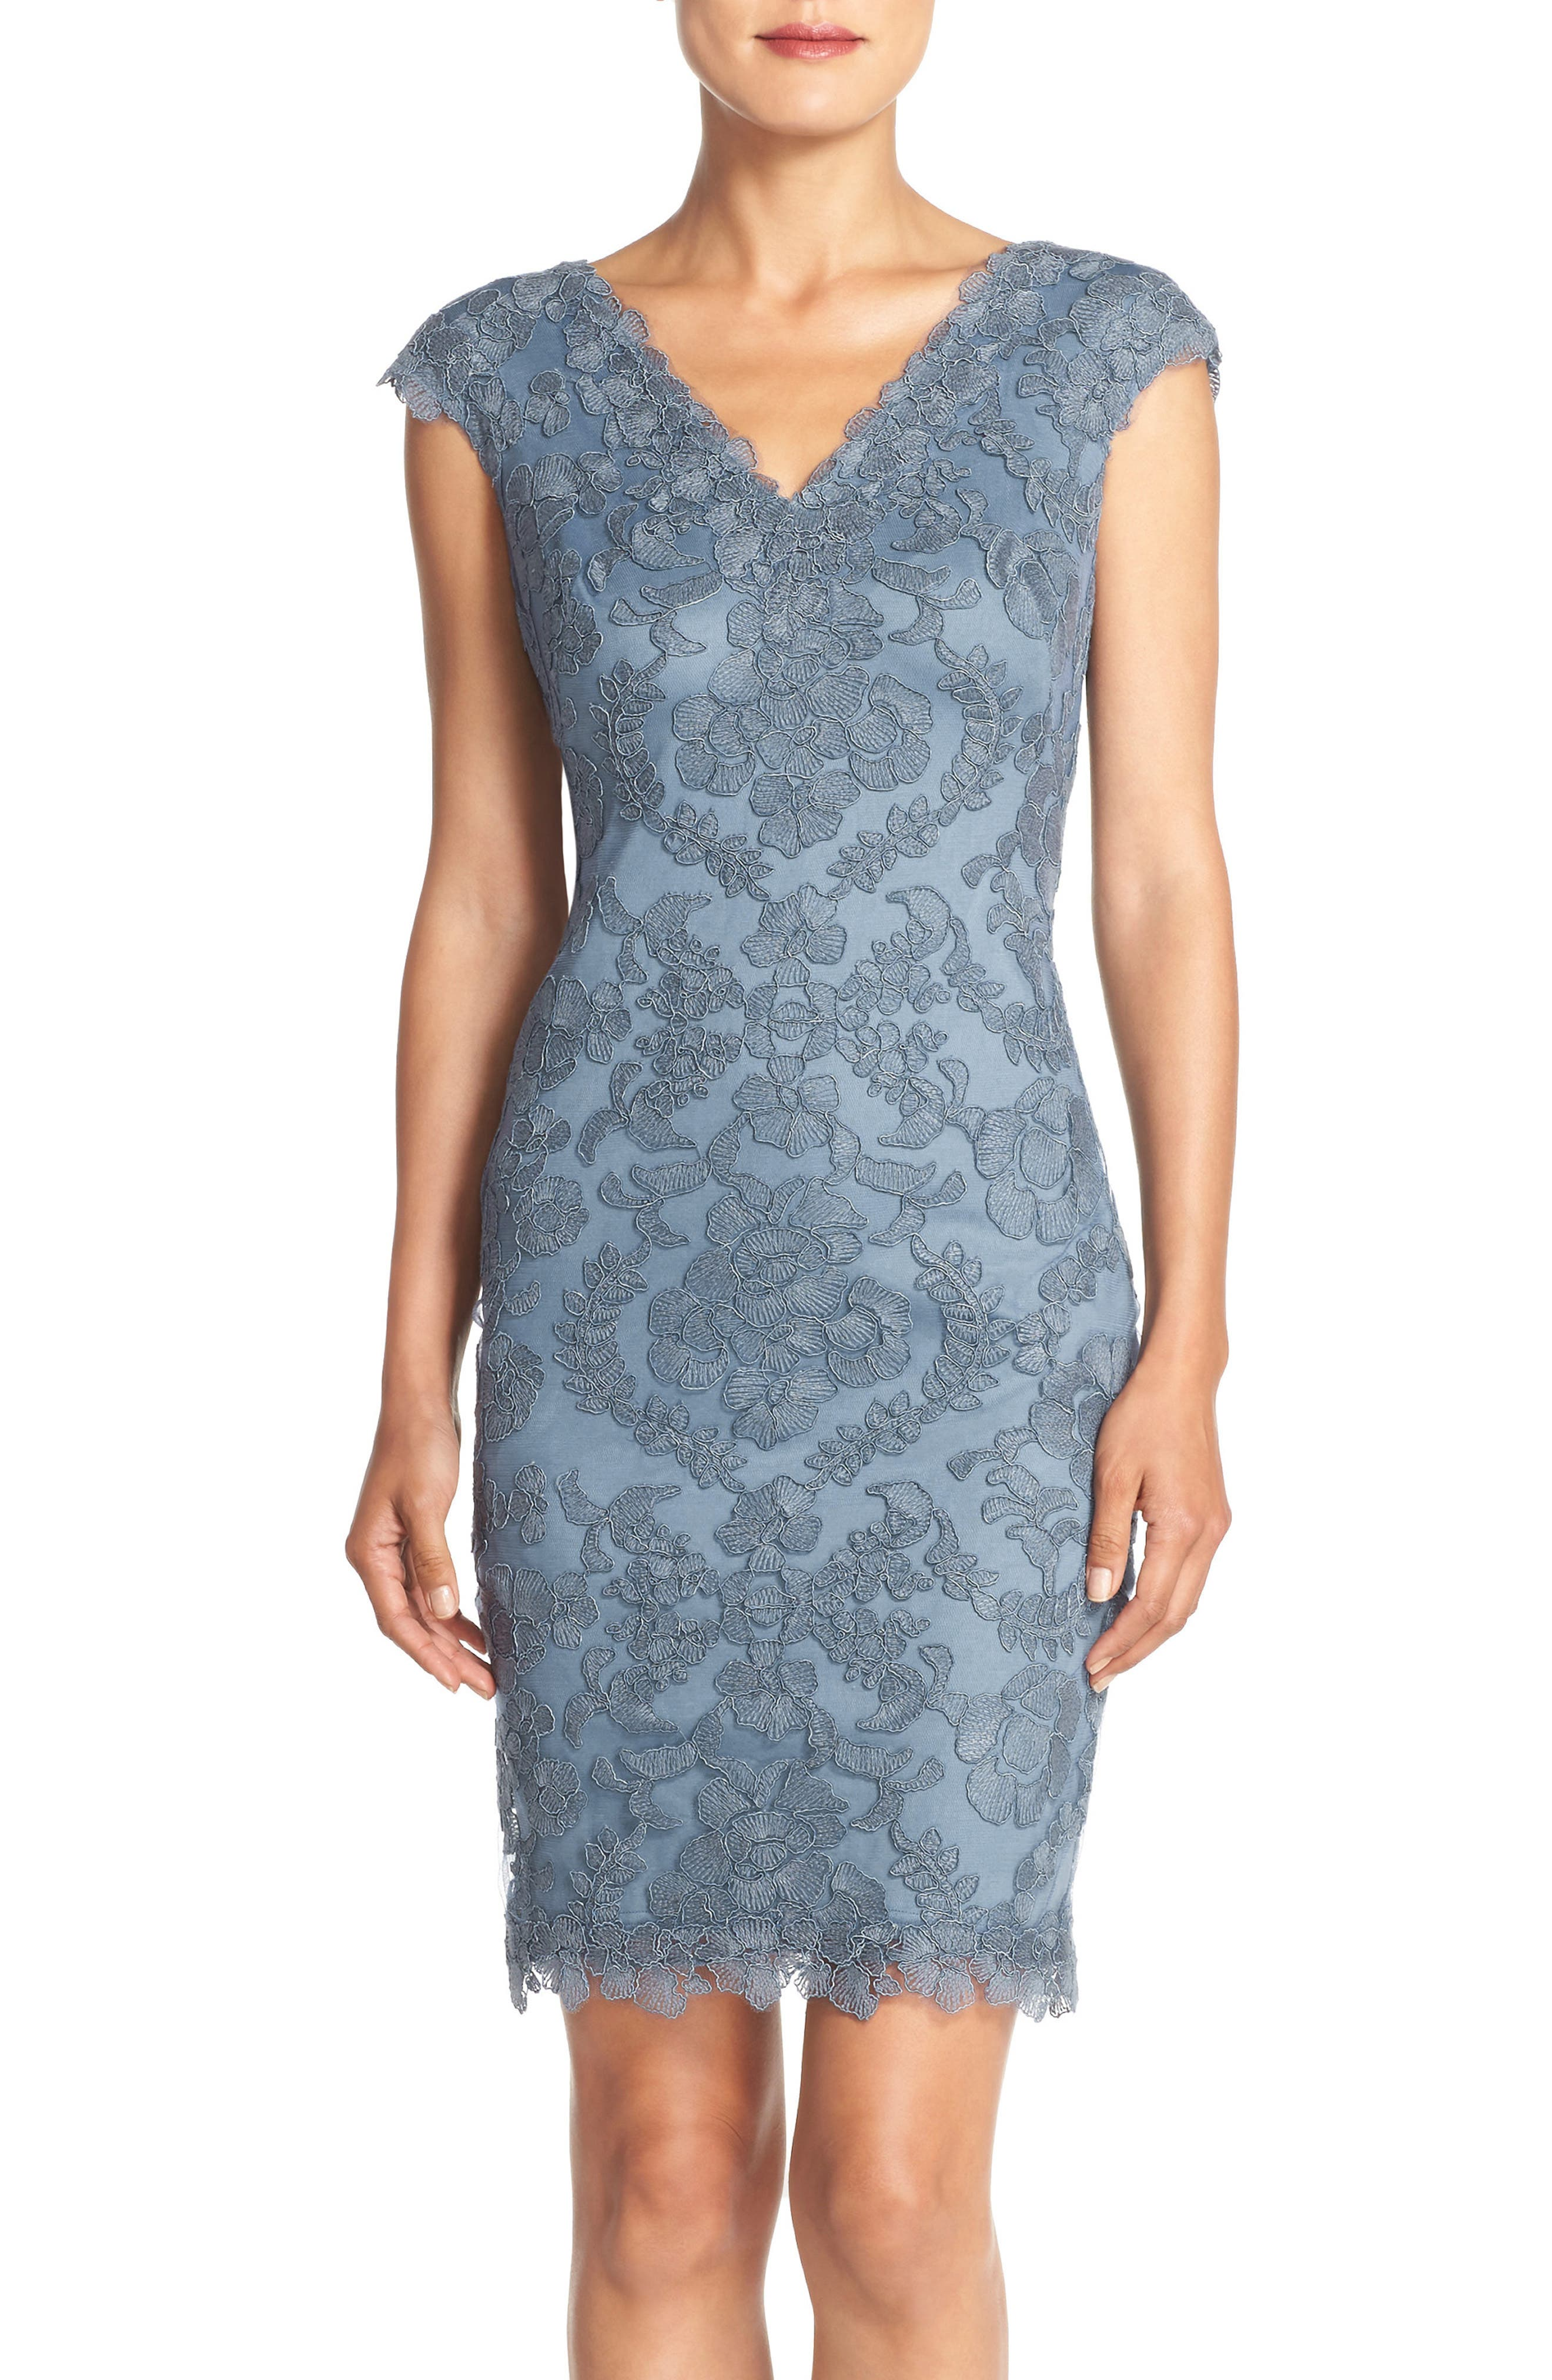 Alternate Image 1 Selected - Tadashi Shoji Embroidered Tulle Sheath Dress